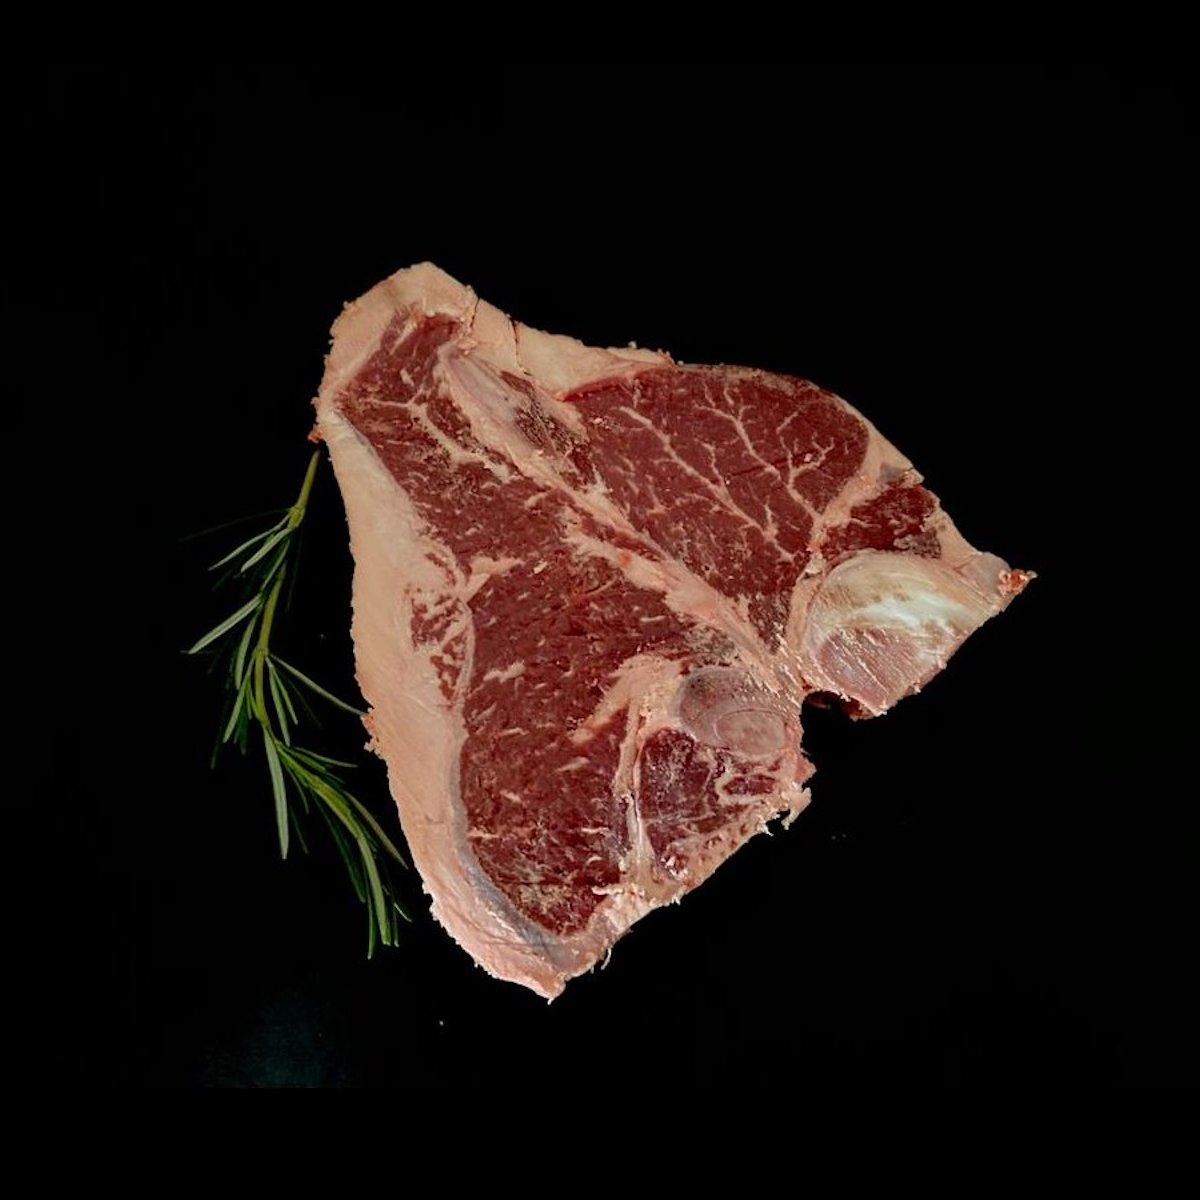 Dry Aged Porterhous Steak - Landmetzgerei Frey